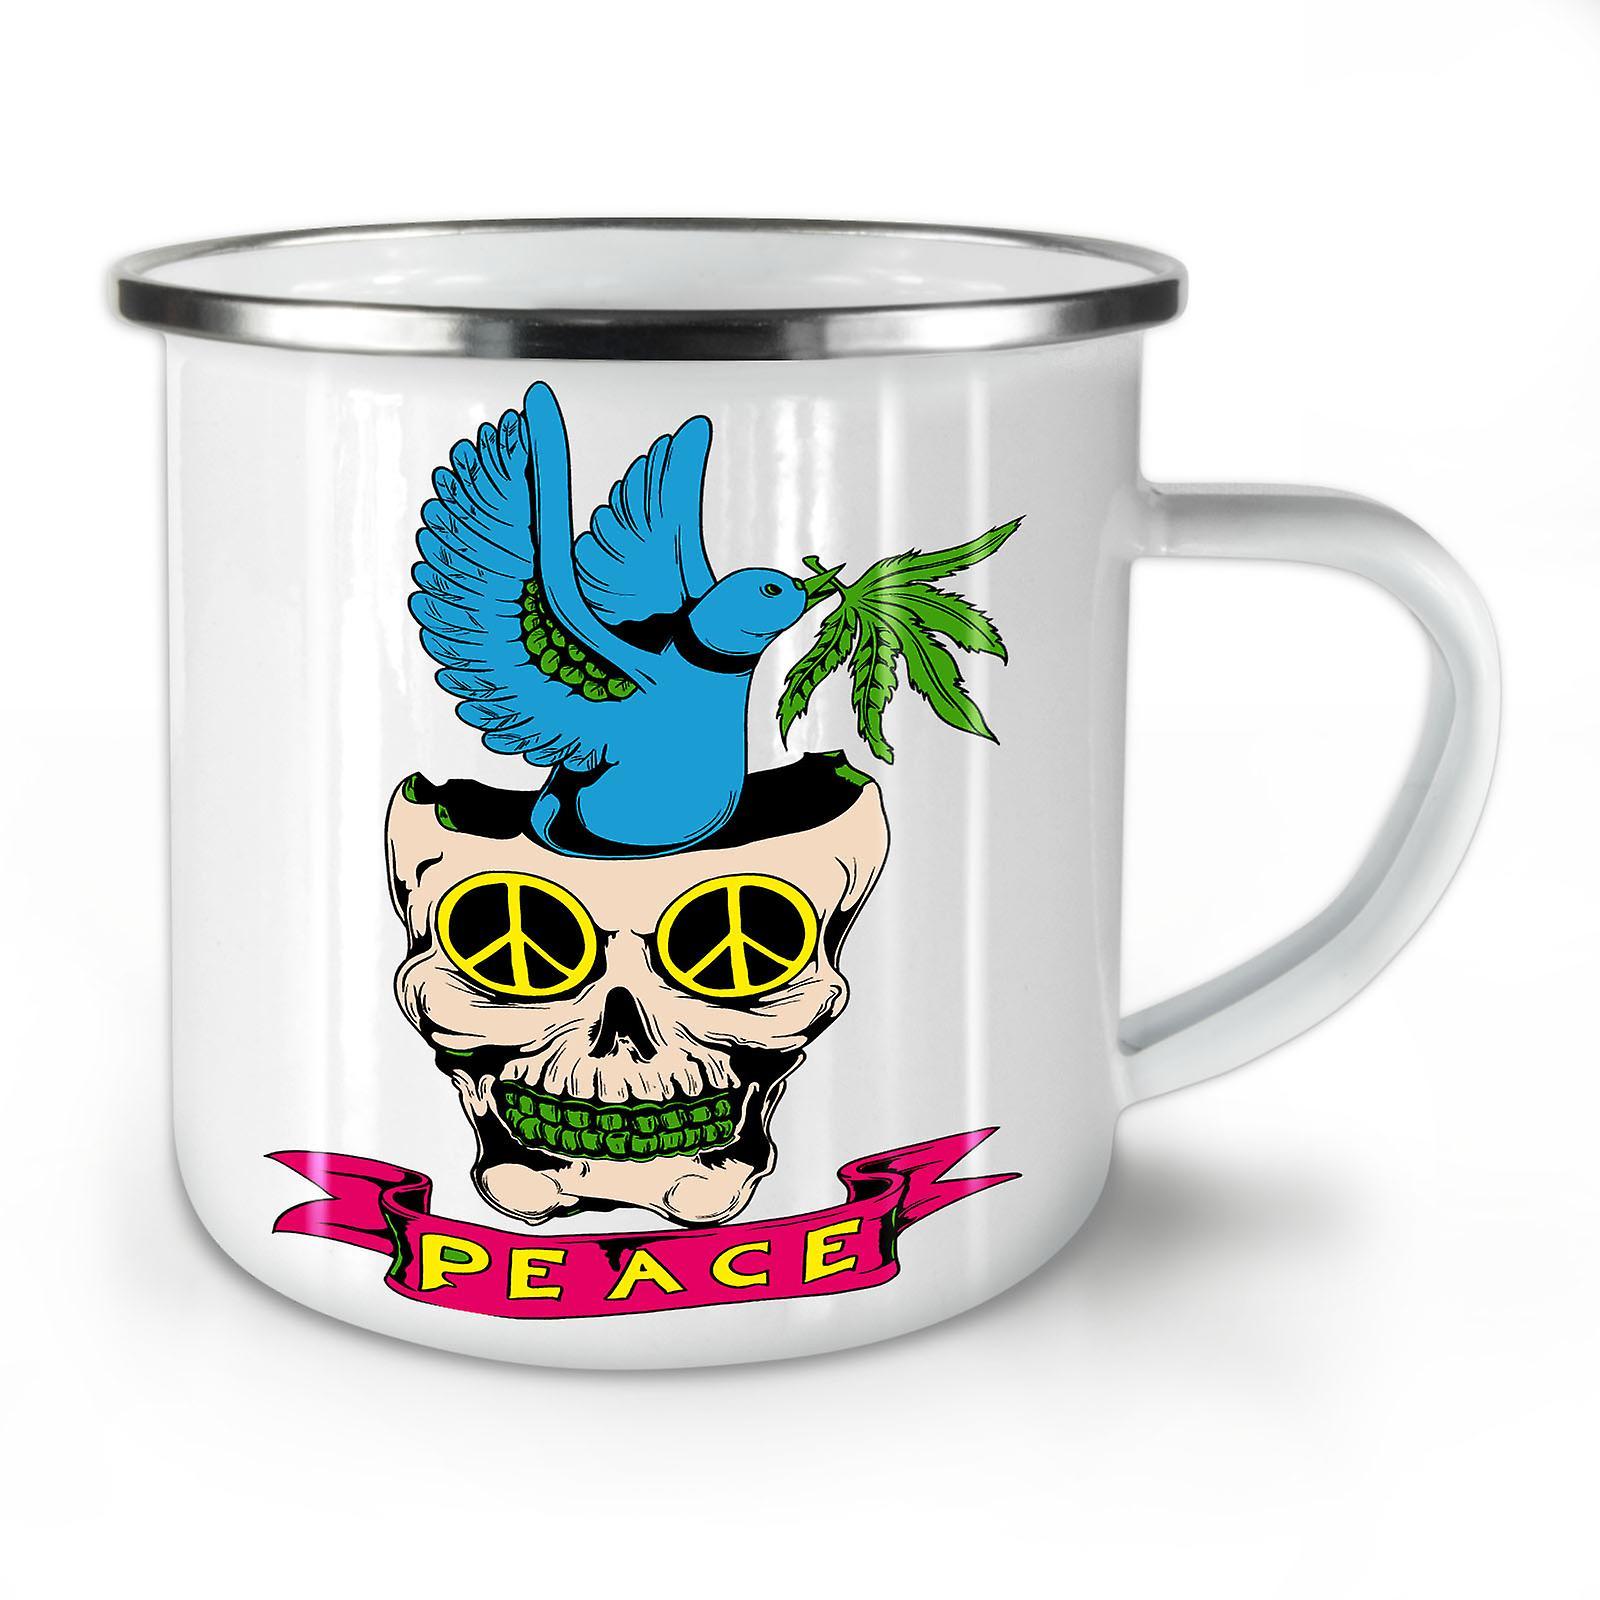 Rasta OzWellcoda Mug10 42 Whitetea Café Paix Crâne Émail Nouvelle q3R4Aj5L